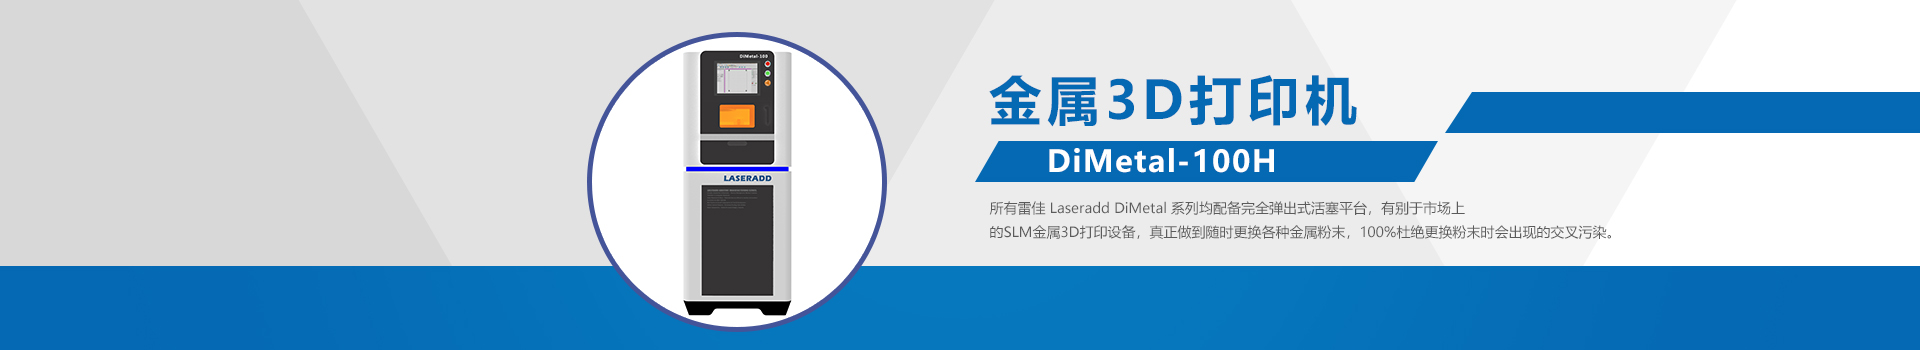 DiMetal-100H 金屬3D打印機